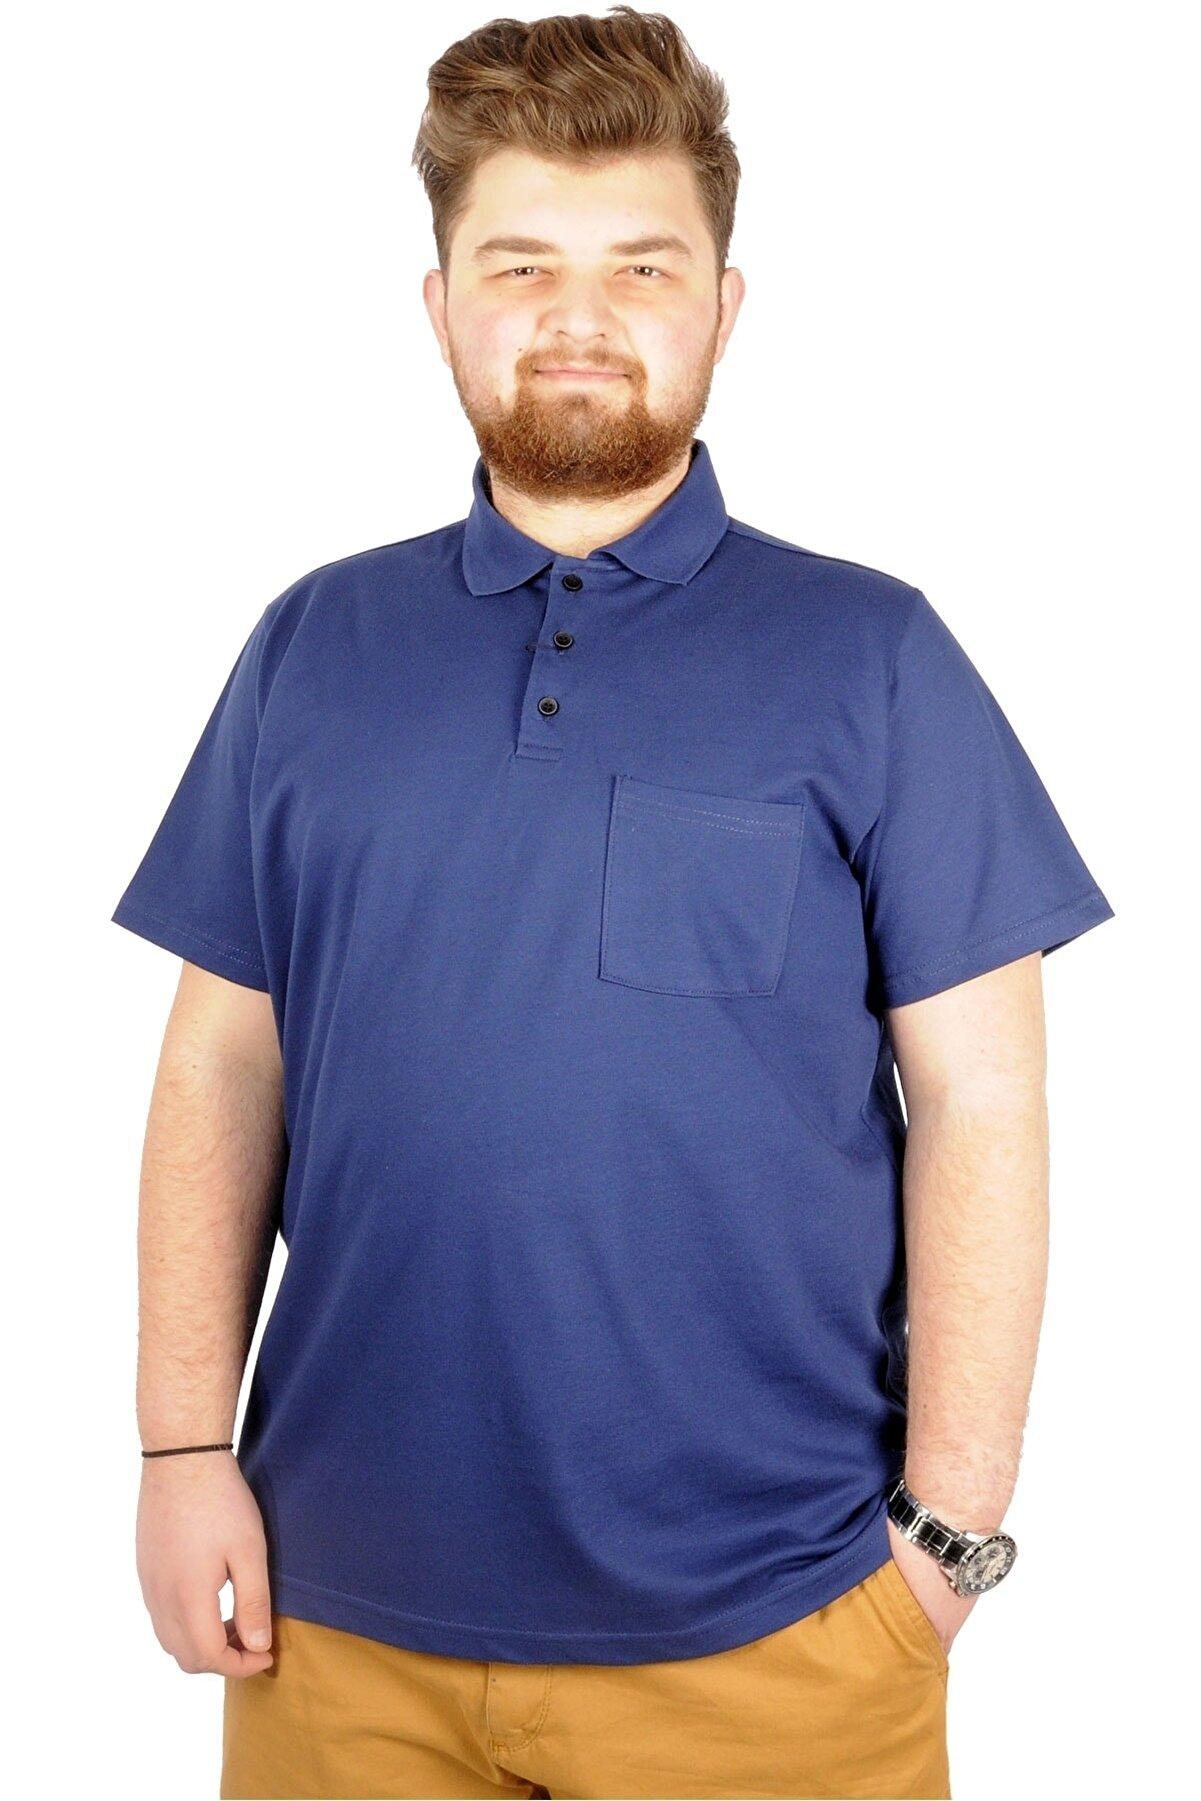 Modexl Indigo  Polo Yaka Cepli Klasik T-shirt 20550